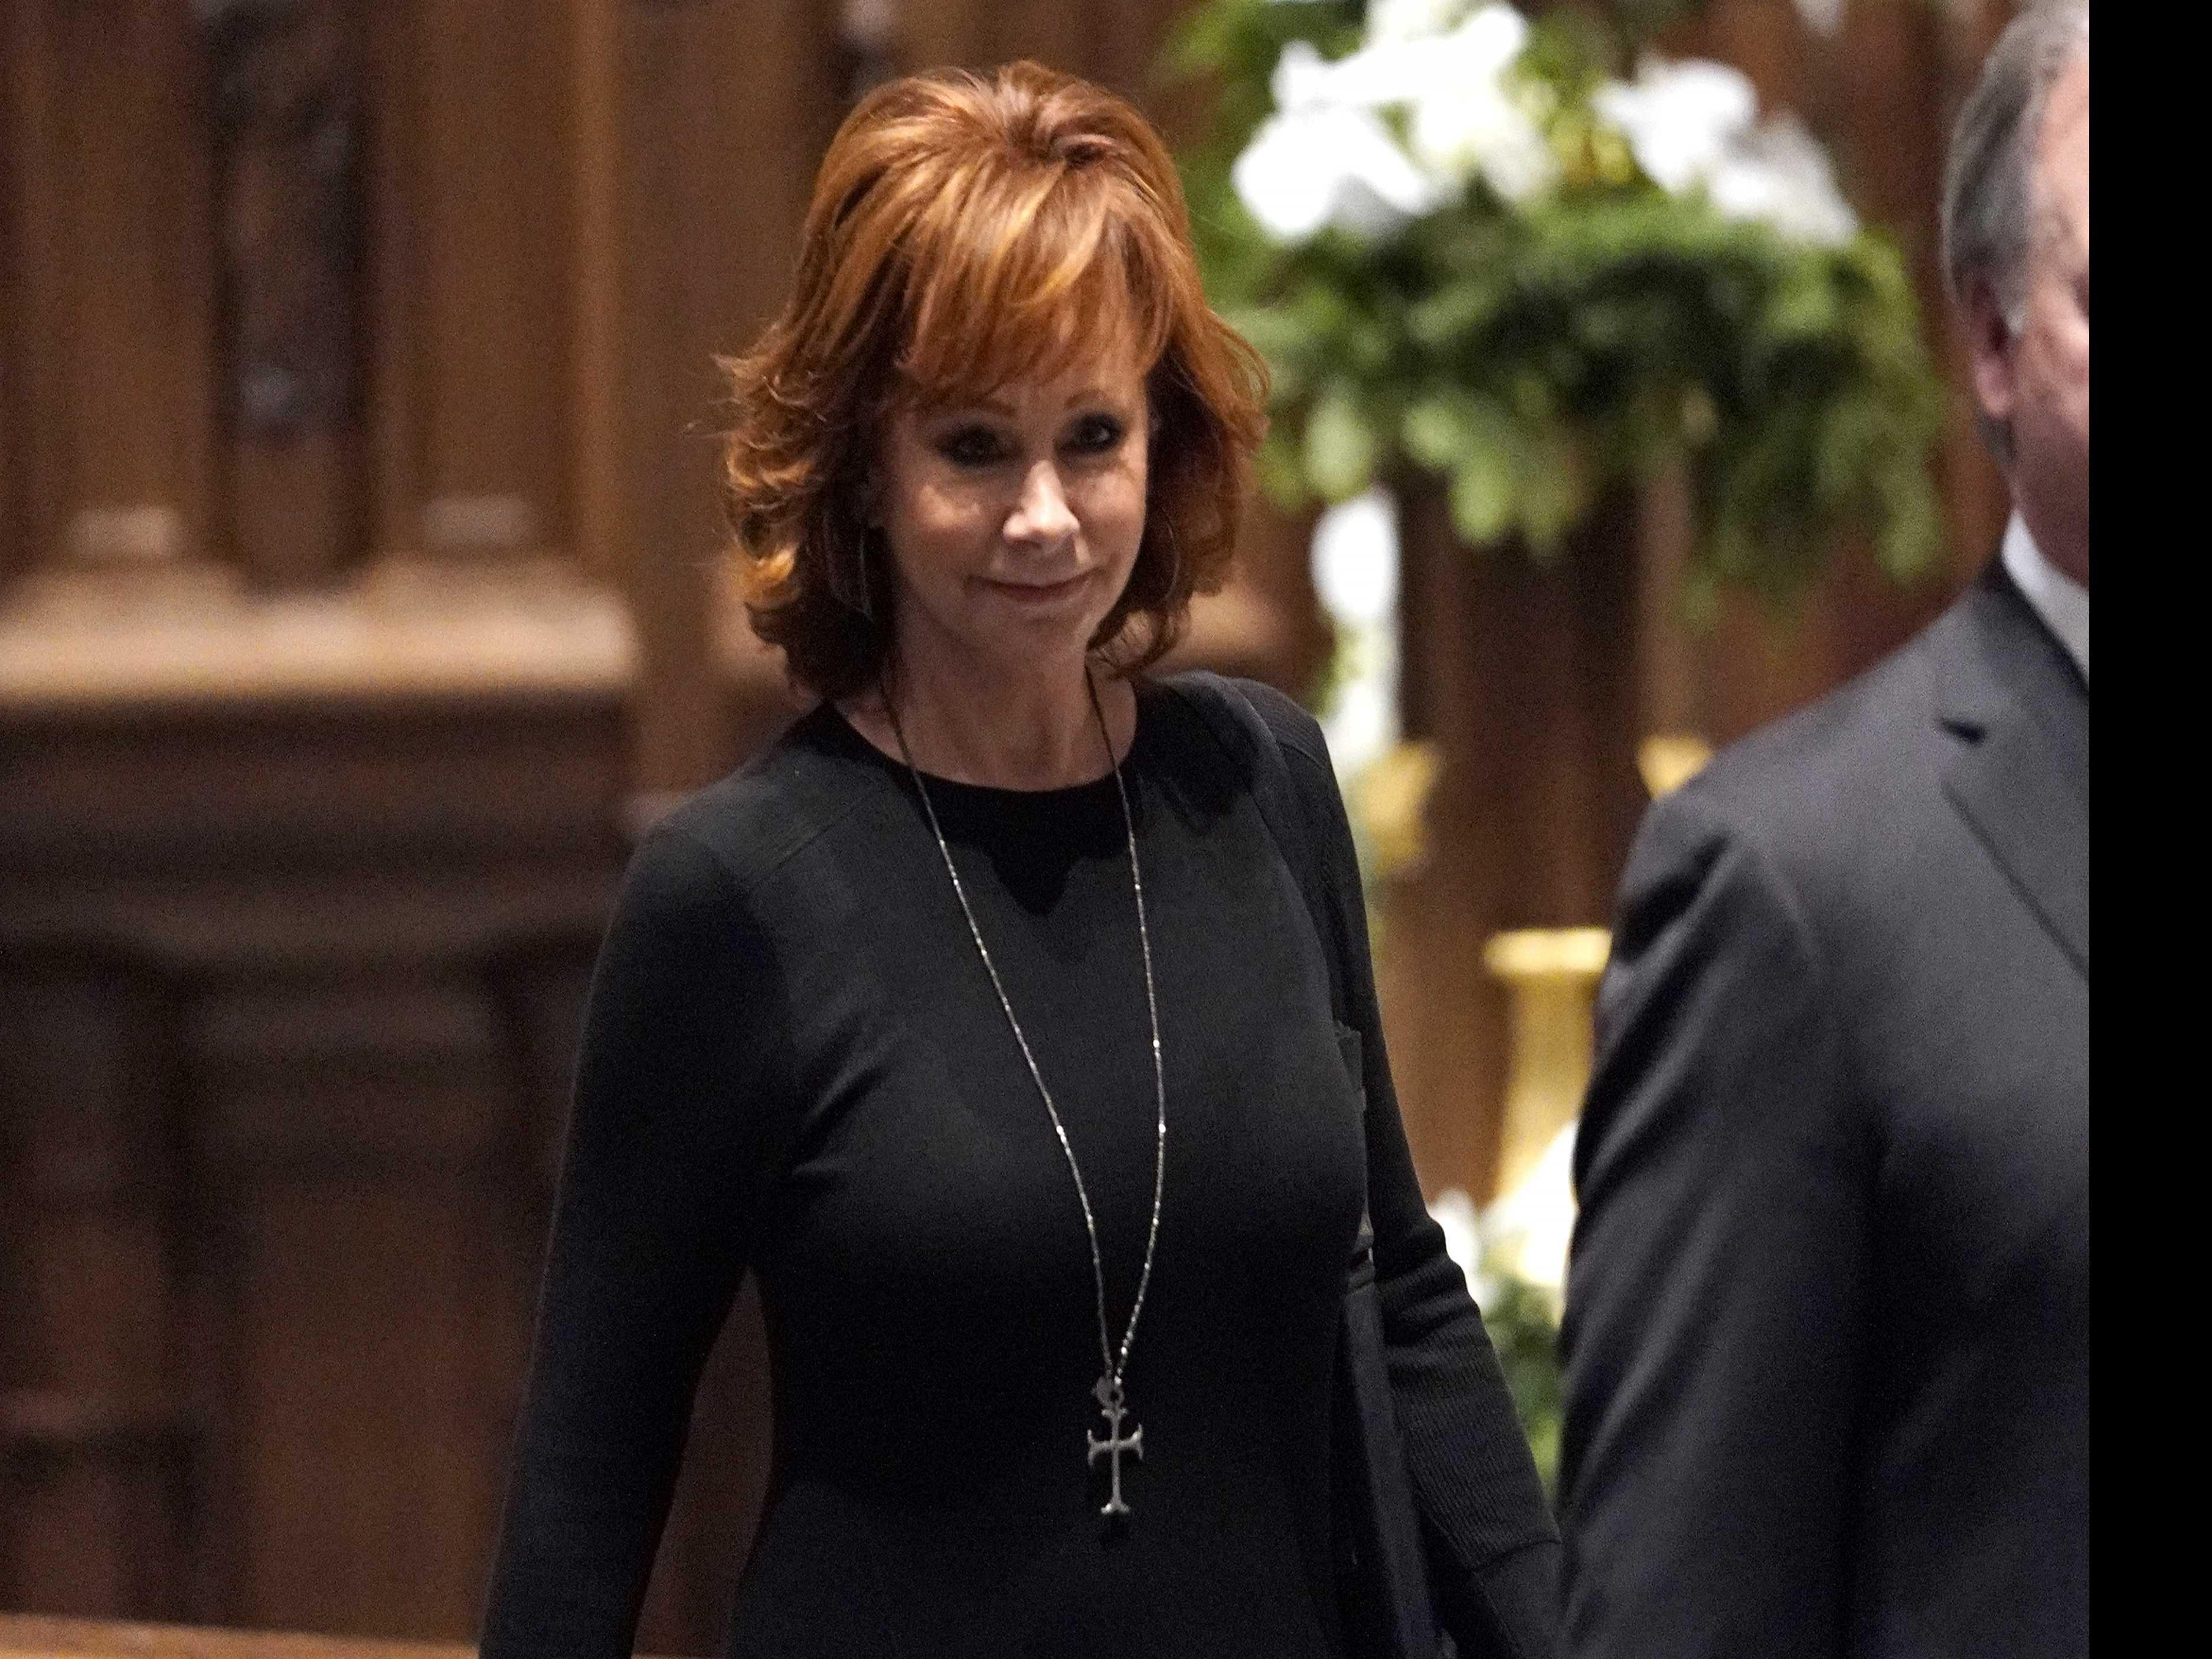 Reba McEntire, Oak Ridge Boys Sing at Bush's Texas Funeral